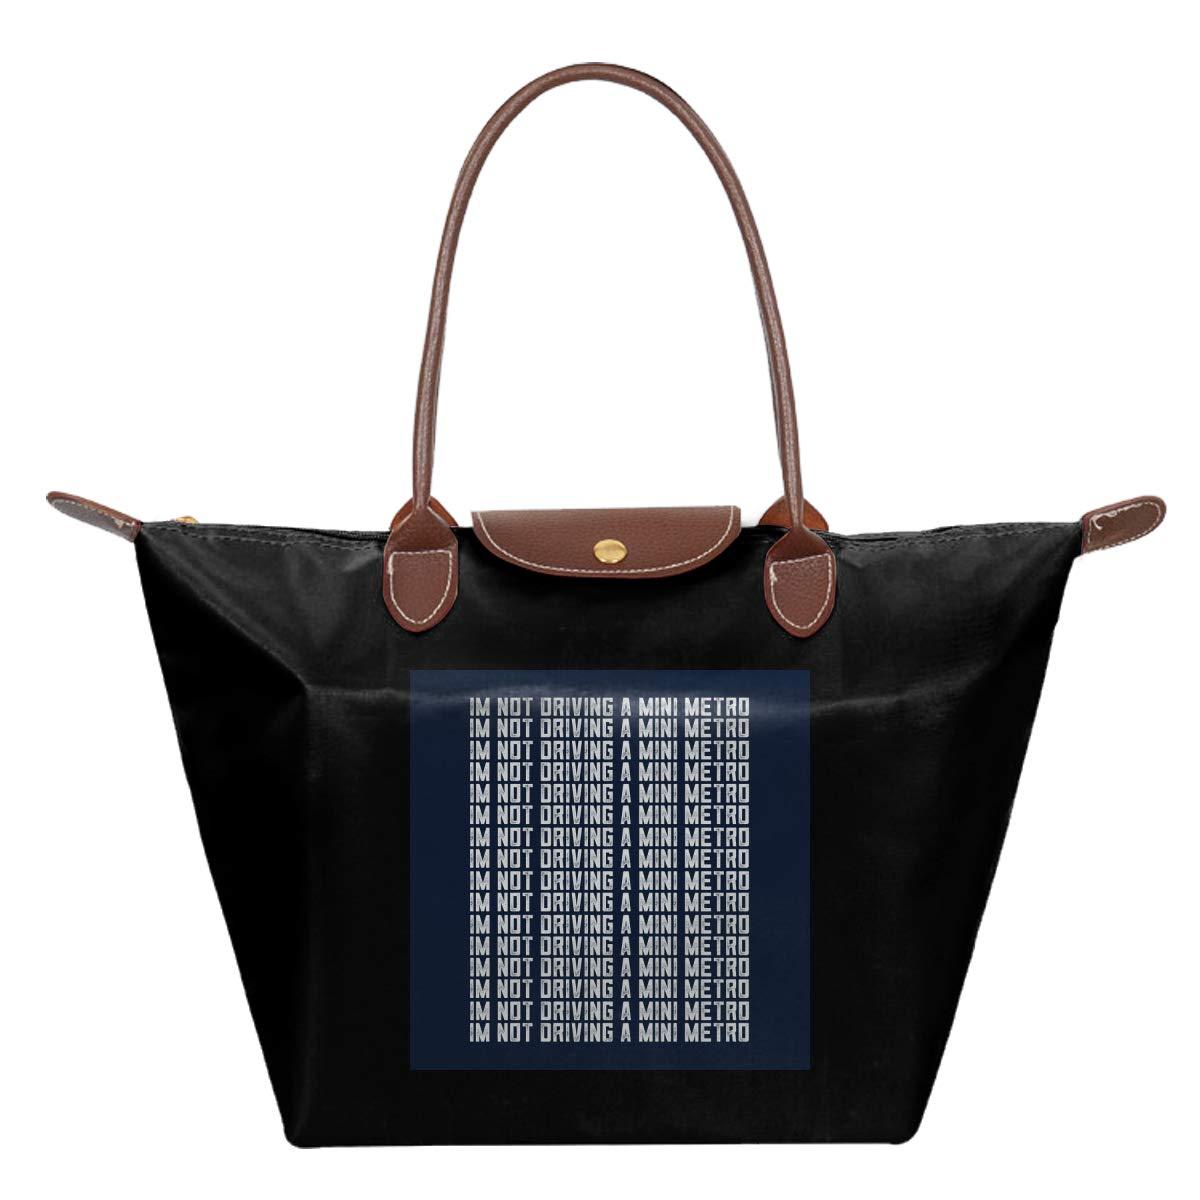 Alan Partridge Im Not Driving A Mini Metro Waterproof Leather Folded Messenger Nylon Bag Travel Tote Hopping Folding School Handbags